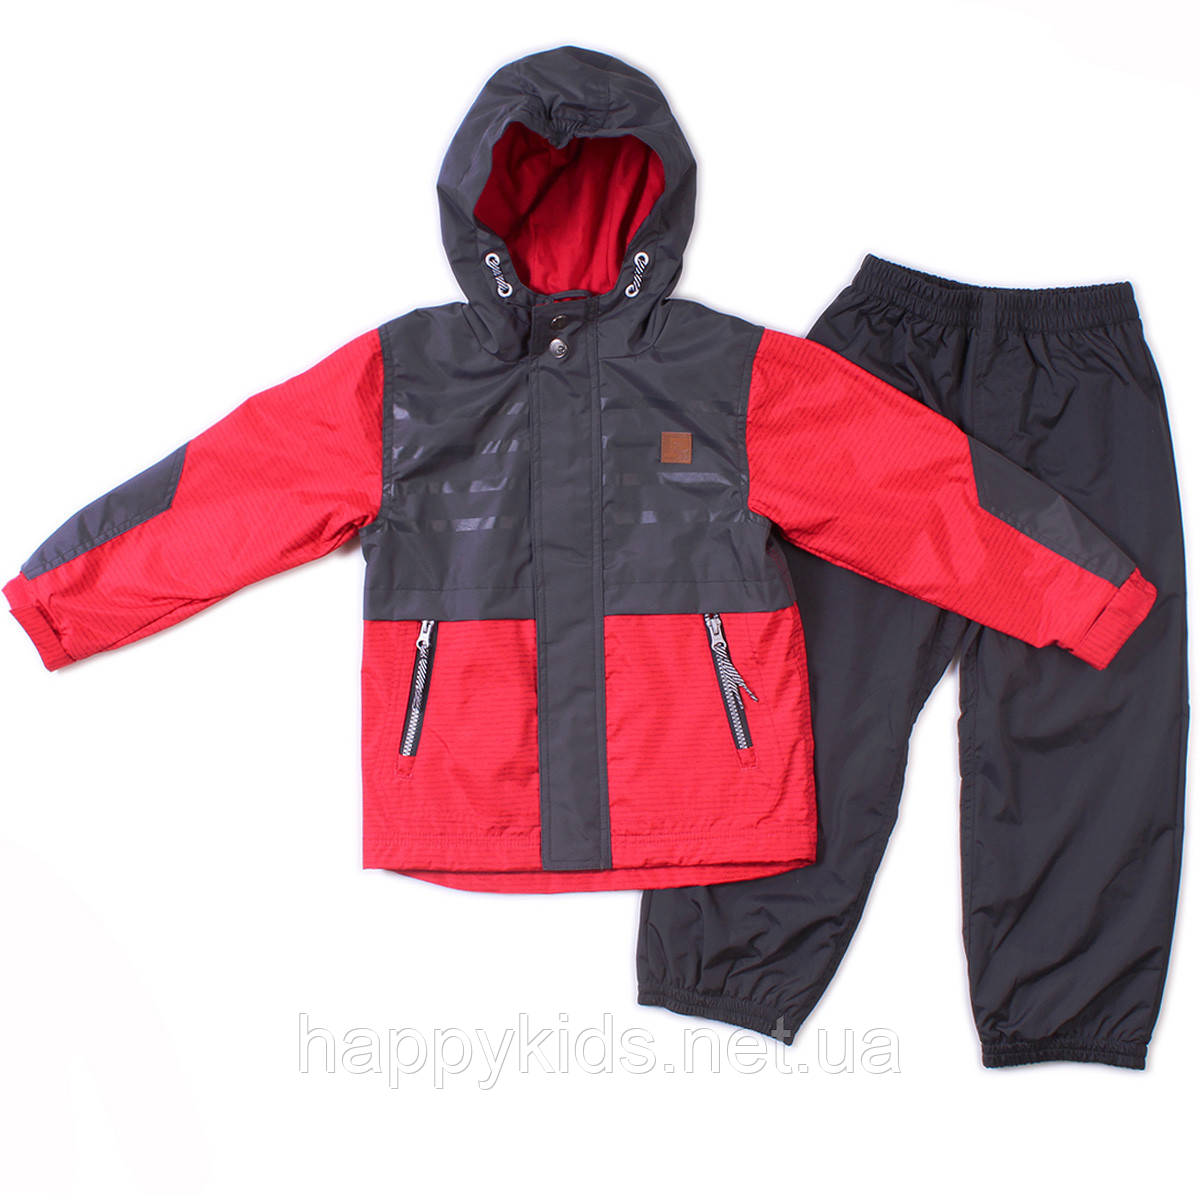 Демисезонный комплект для мальчика Peluche S18 M 57 EG Really Red. Размер 104-122.